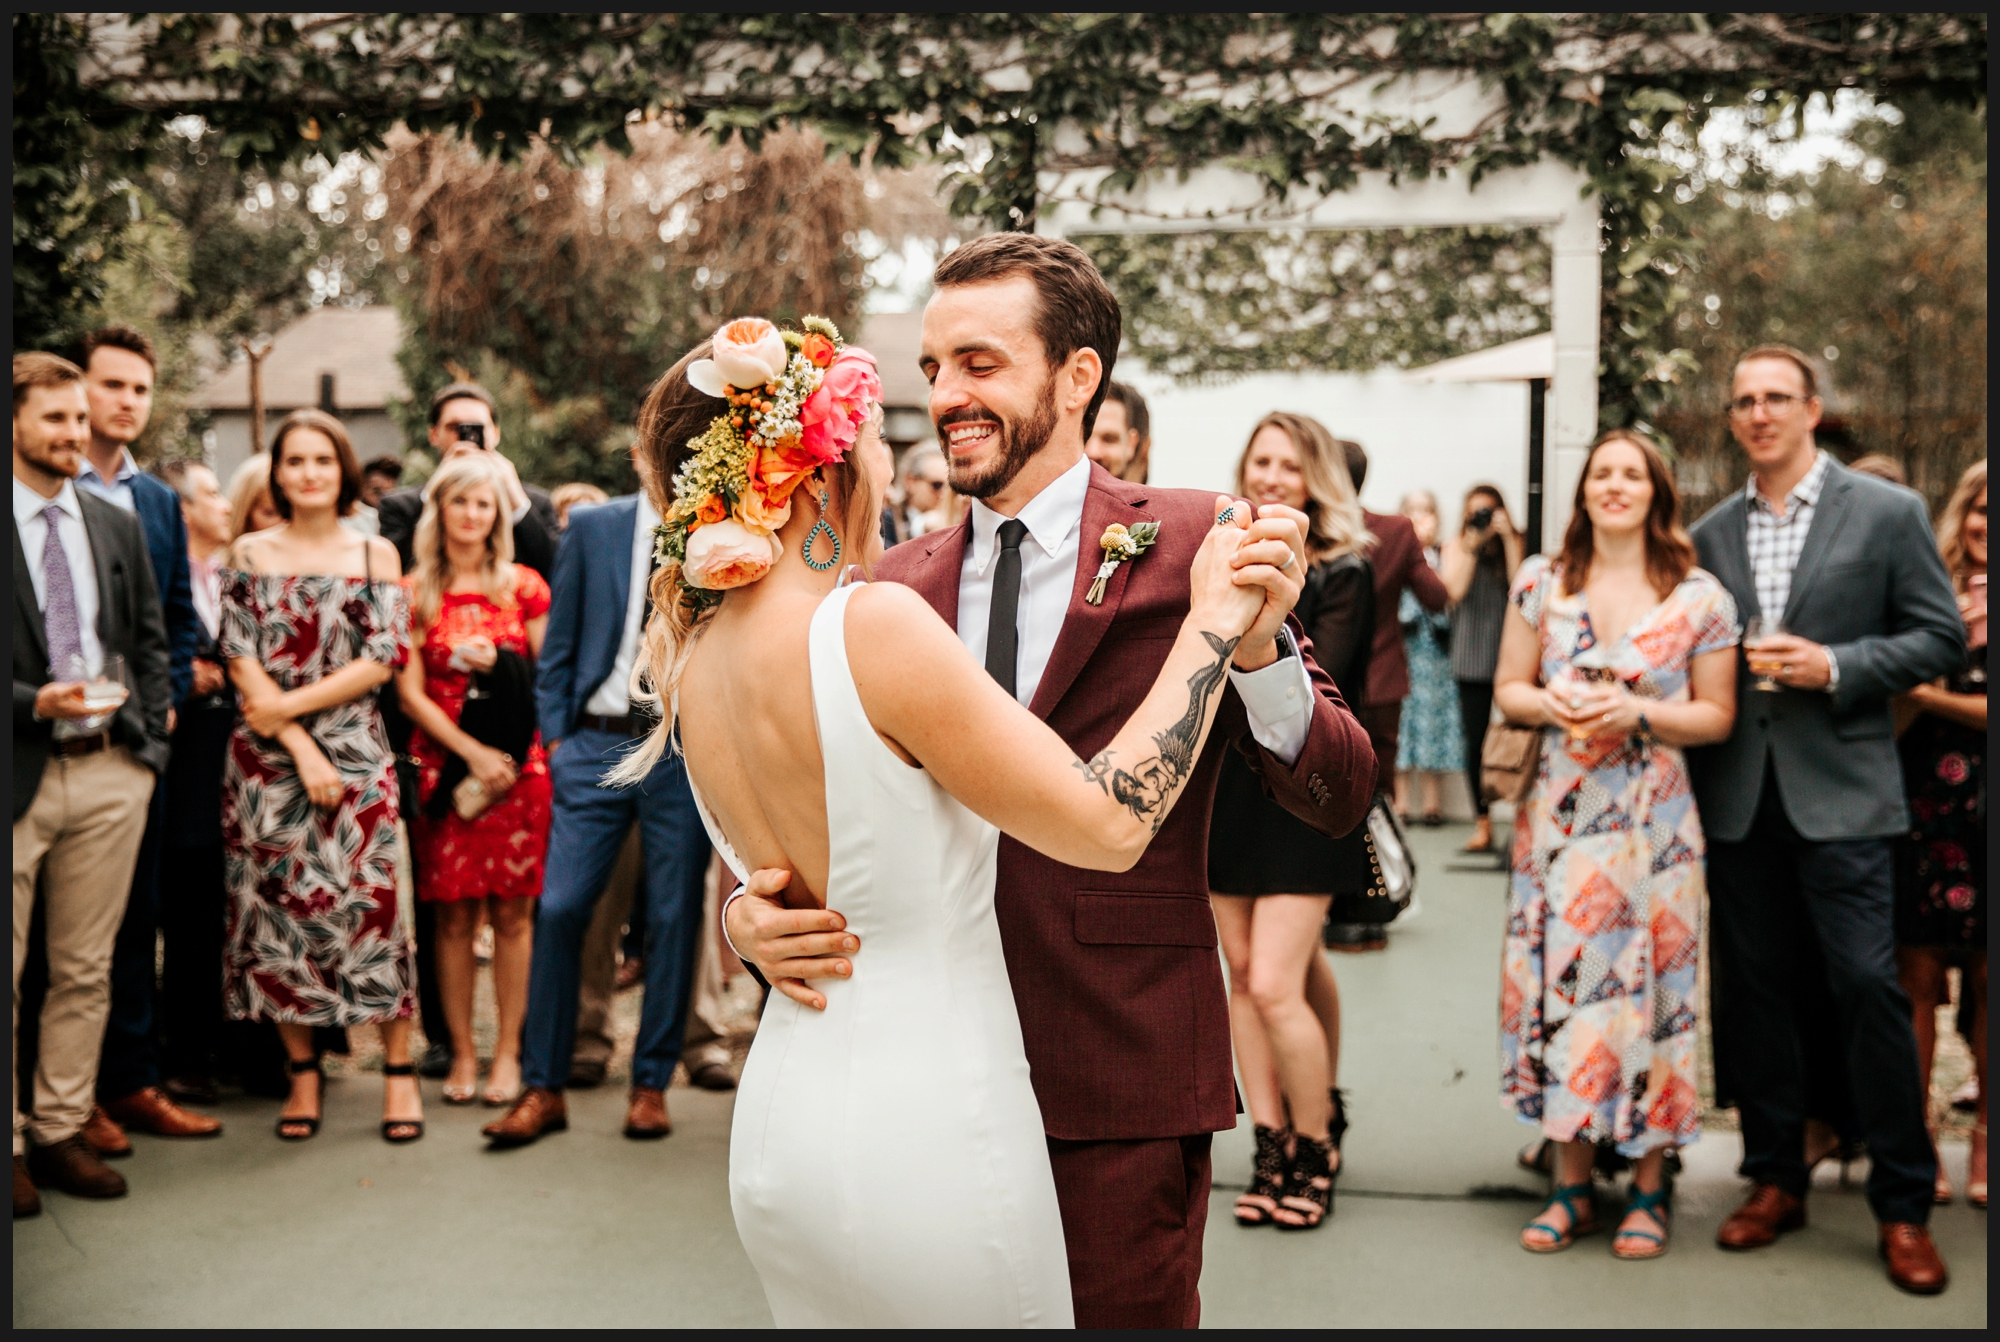 Orlando-Wedding-Photographer-destination-wedding-photographer-florida-wedding-photographer-bohemian-wedding-photographer_2036.jpg